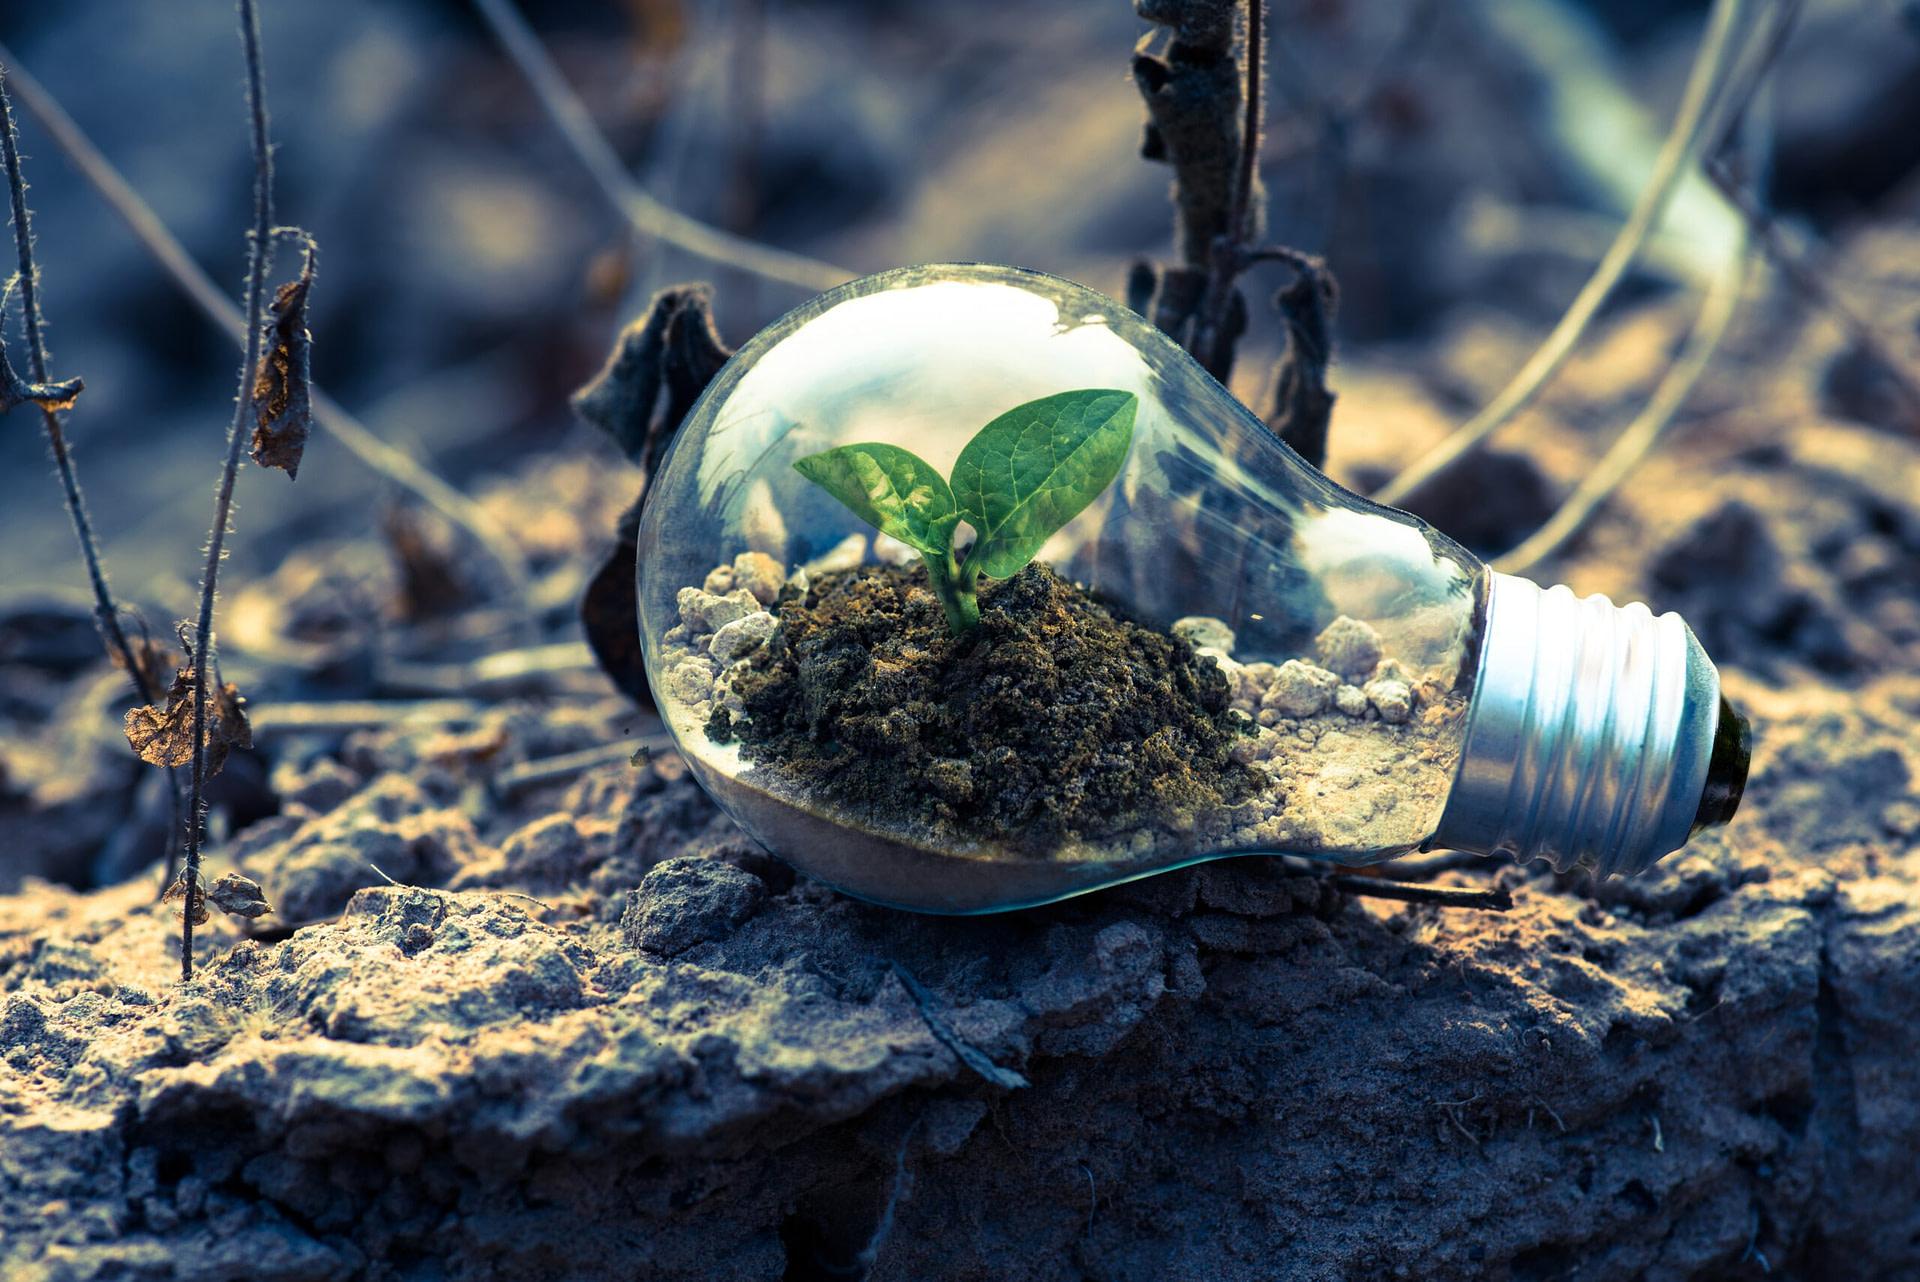 samenwerking Van uitdaging naar kans – Deel 1: samenwerking en verbinding clear light bulb planter on gray rock 1108572 scaled